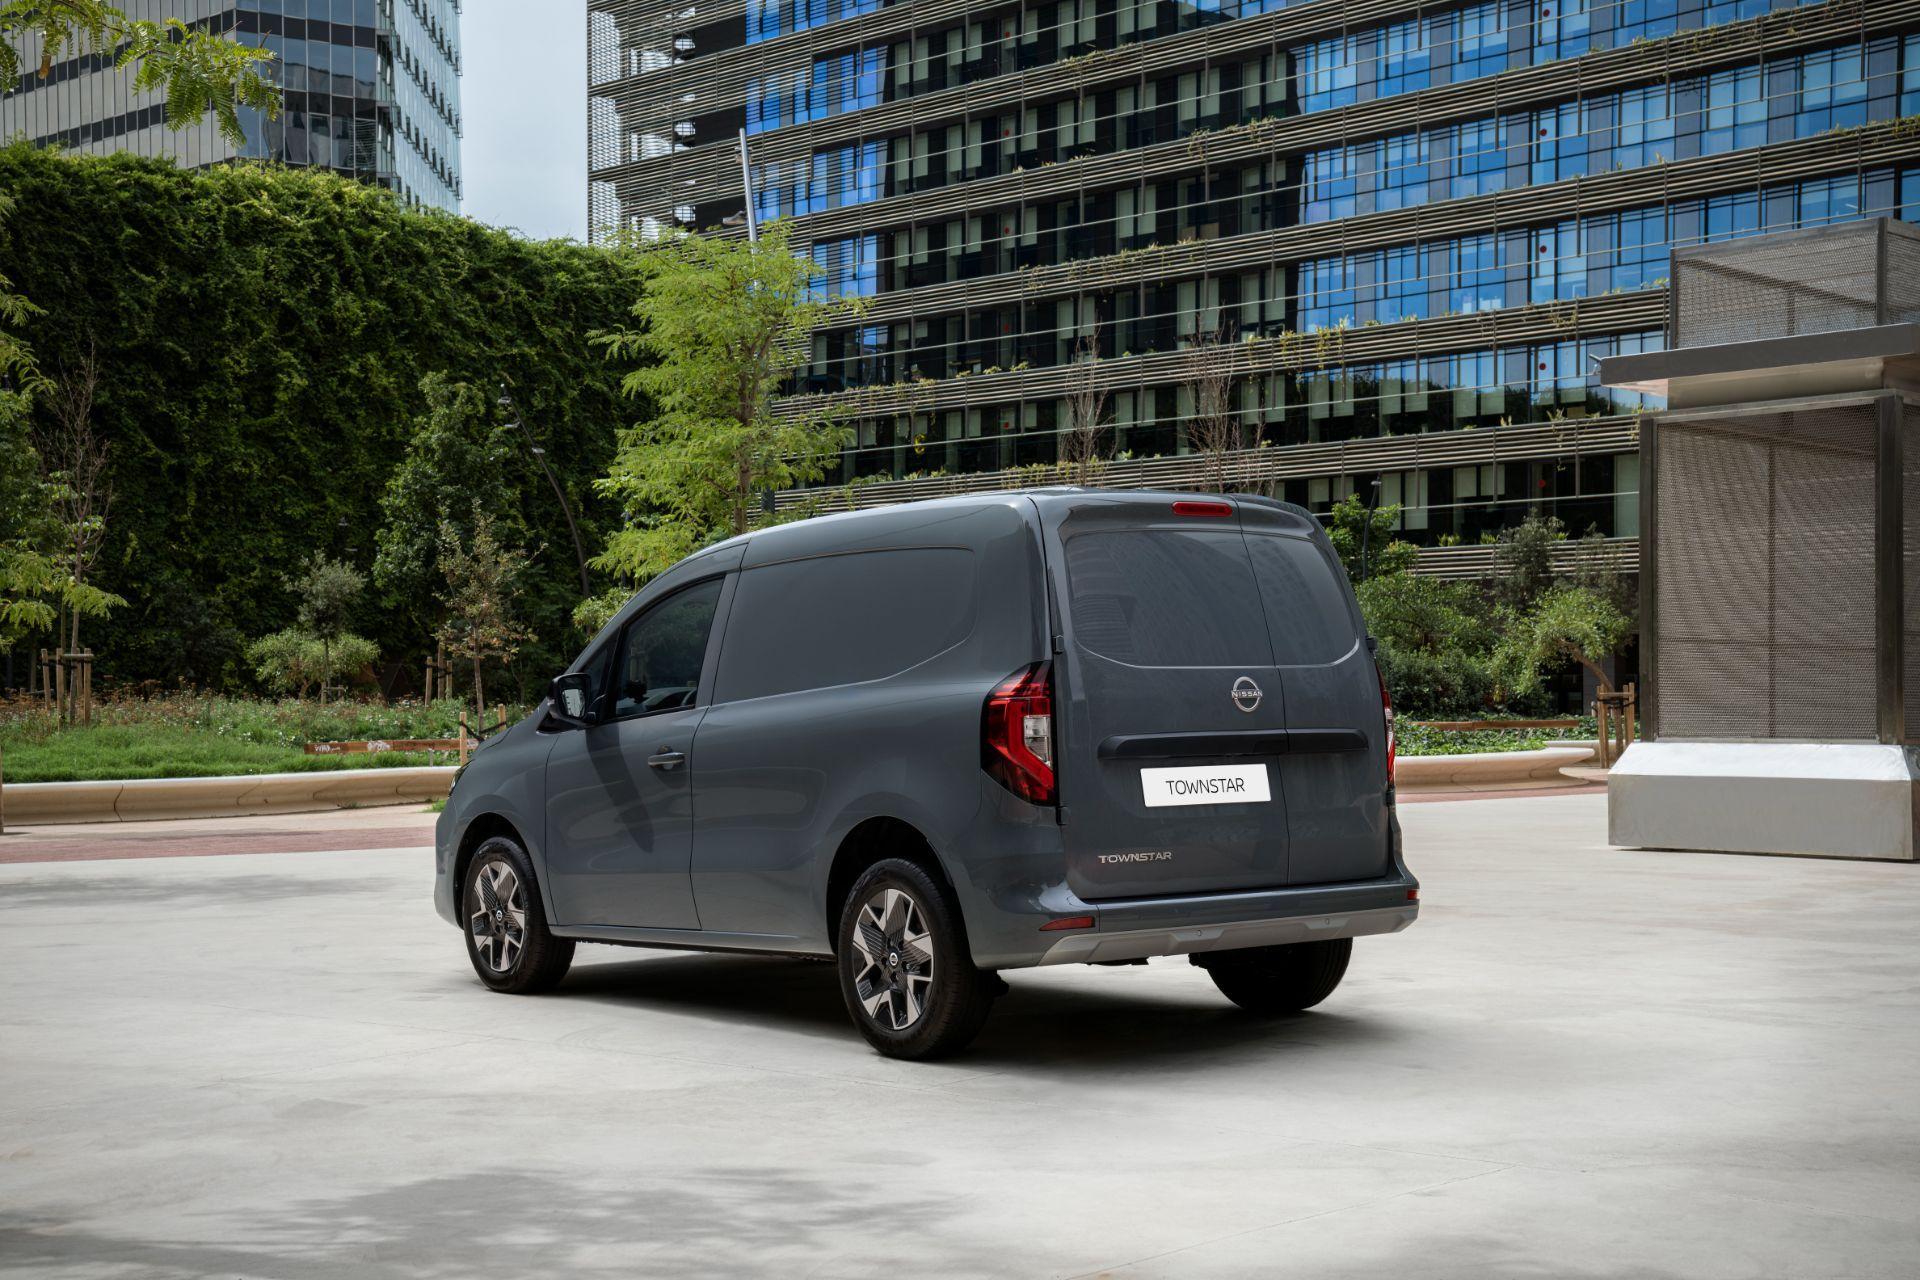 2022-Nissan-Townstar-petrol-van-dynamic-9